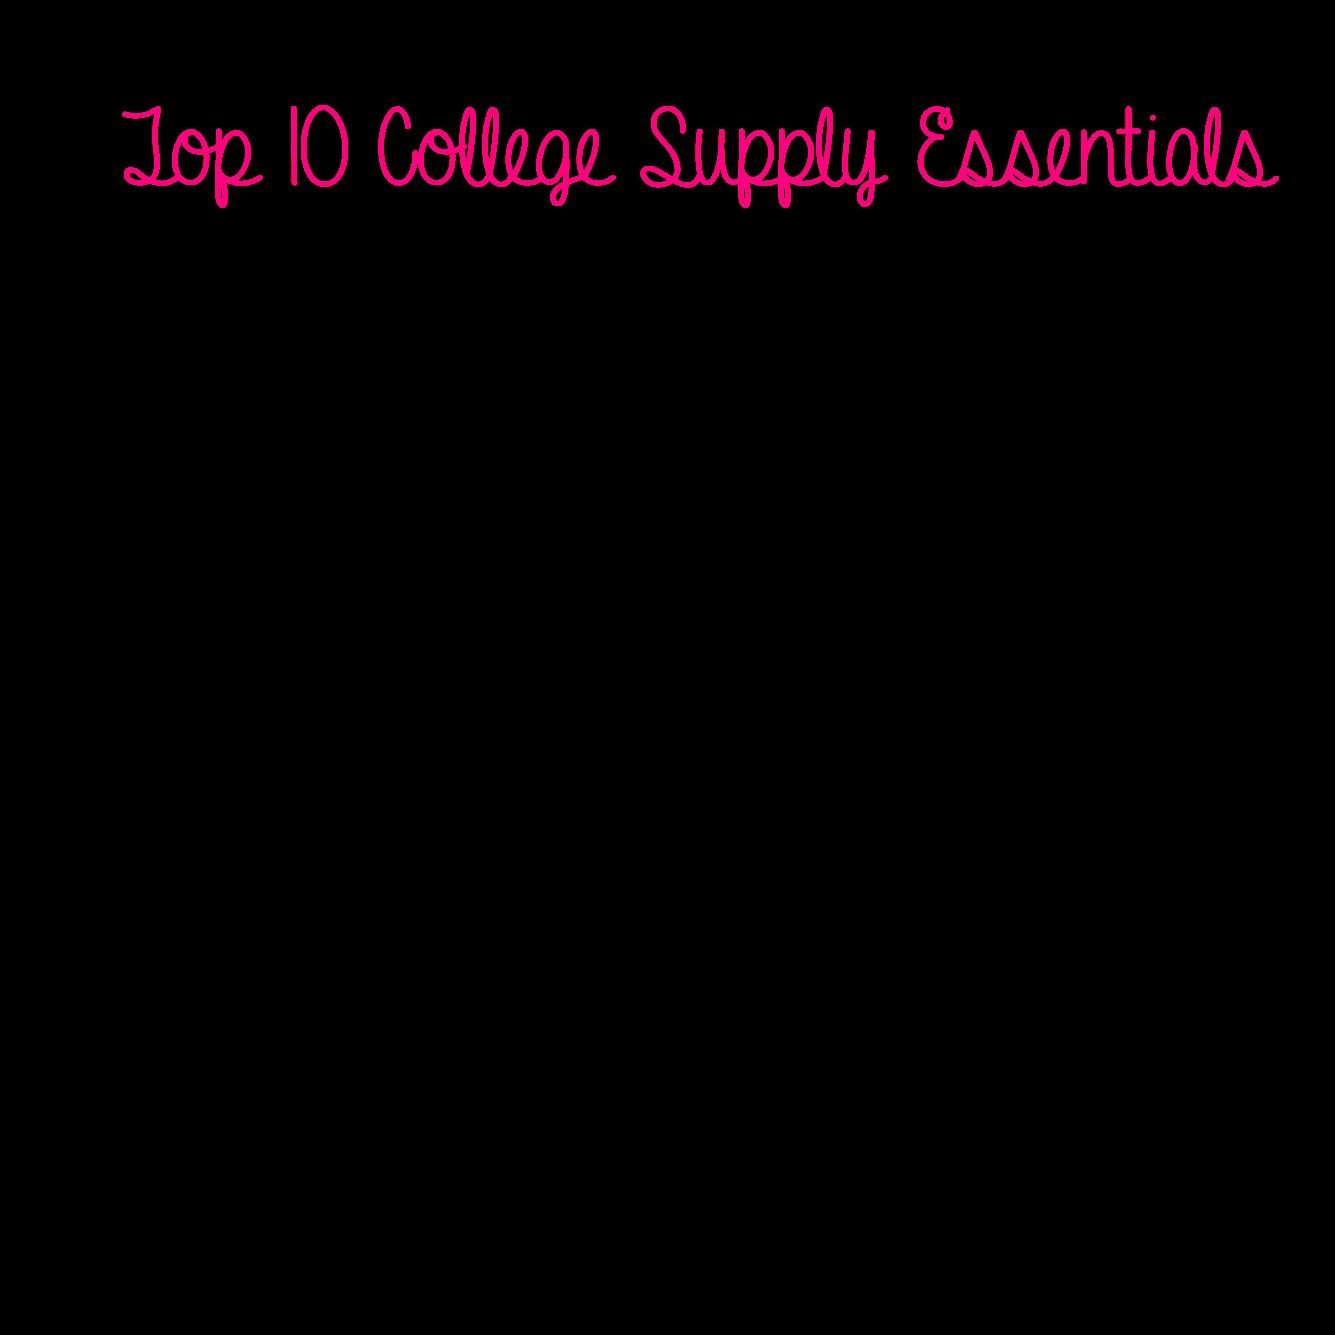 School Supply List: College School Supply List